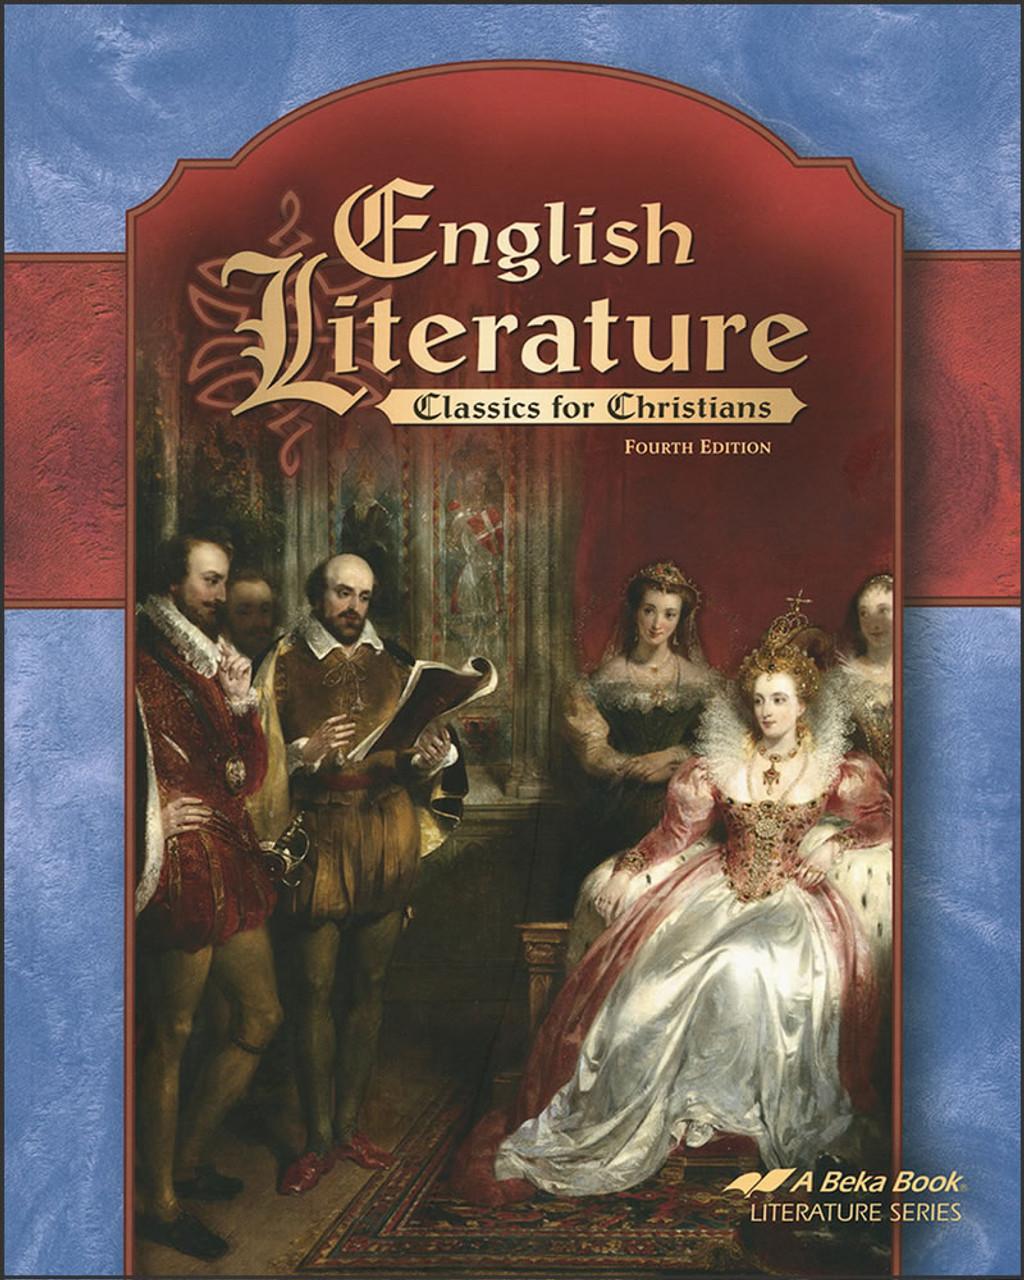 English Literature: Classics for Christians, 4th edition